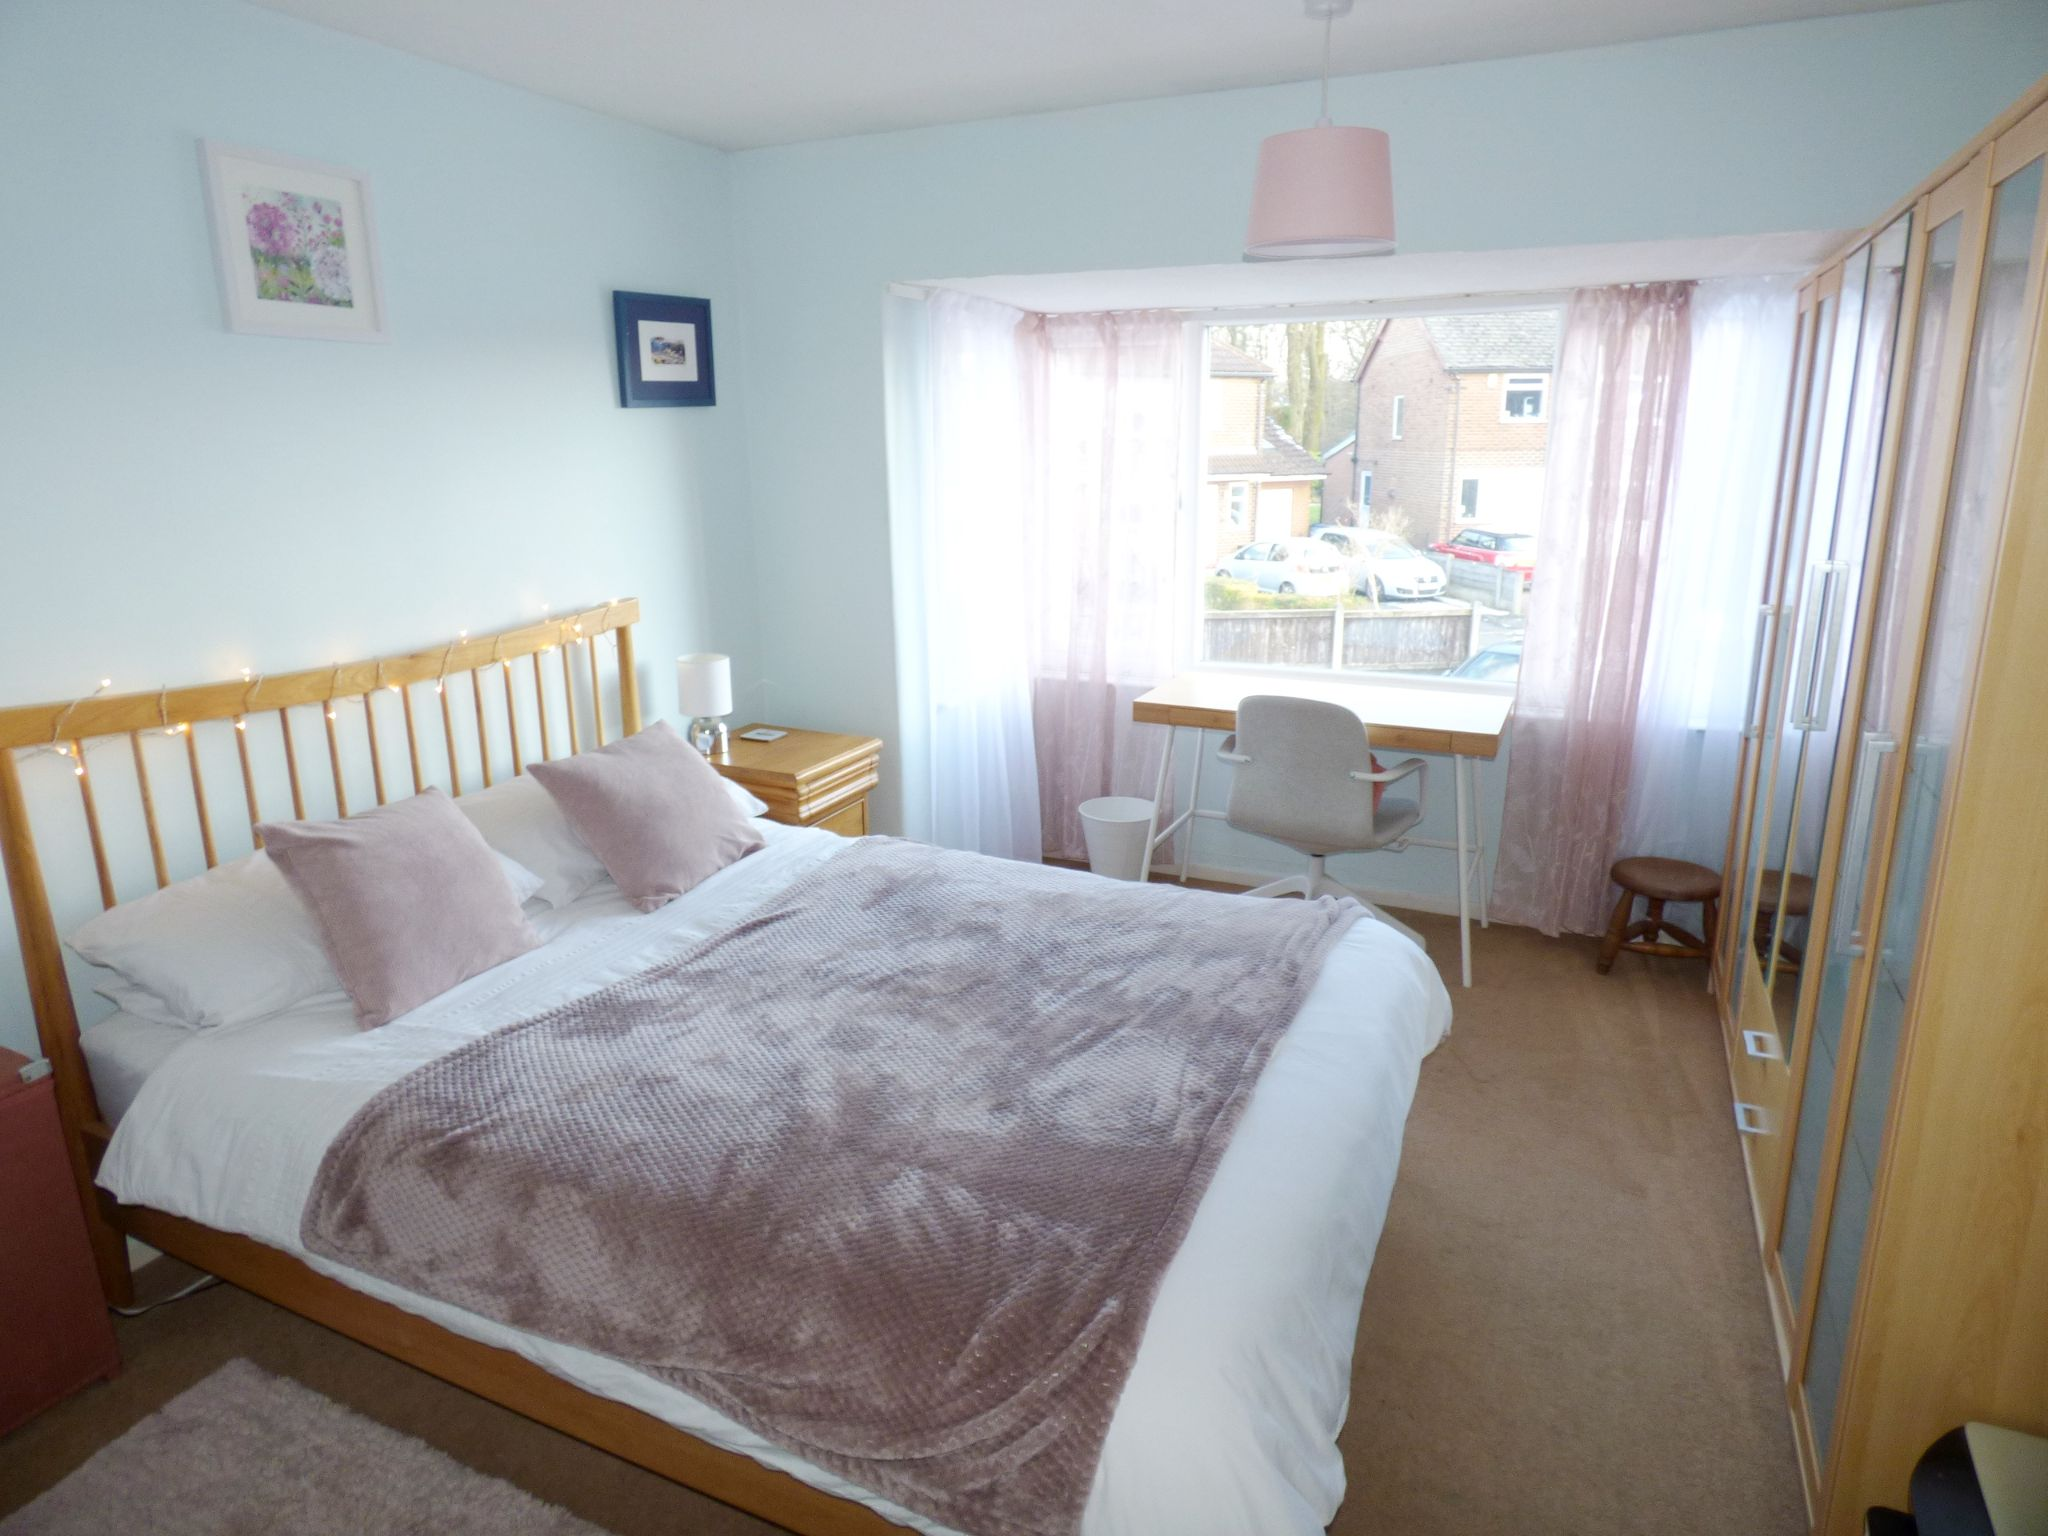 3 Bedroom Semi-detached House For Sale - Bedroom One